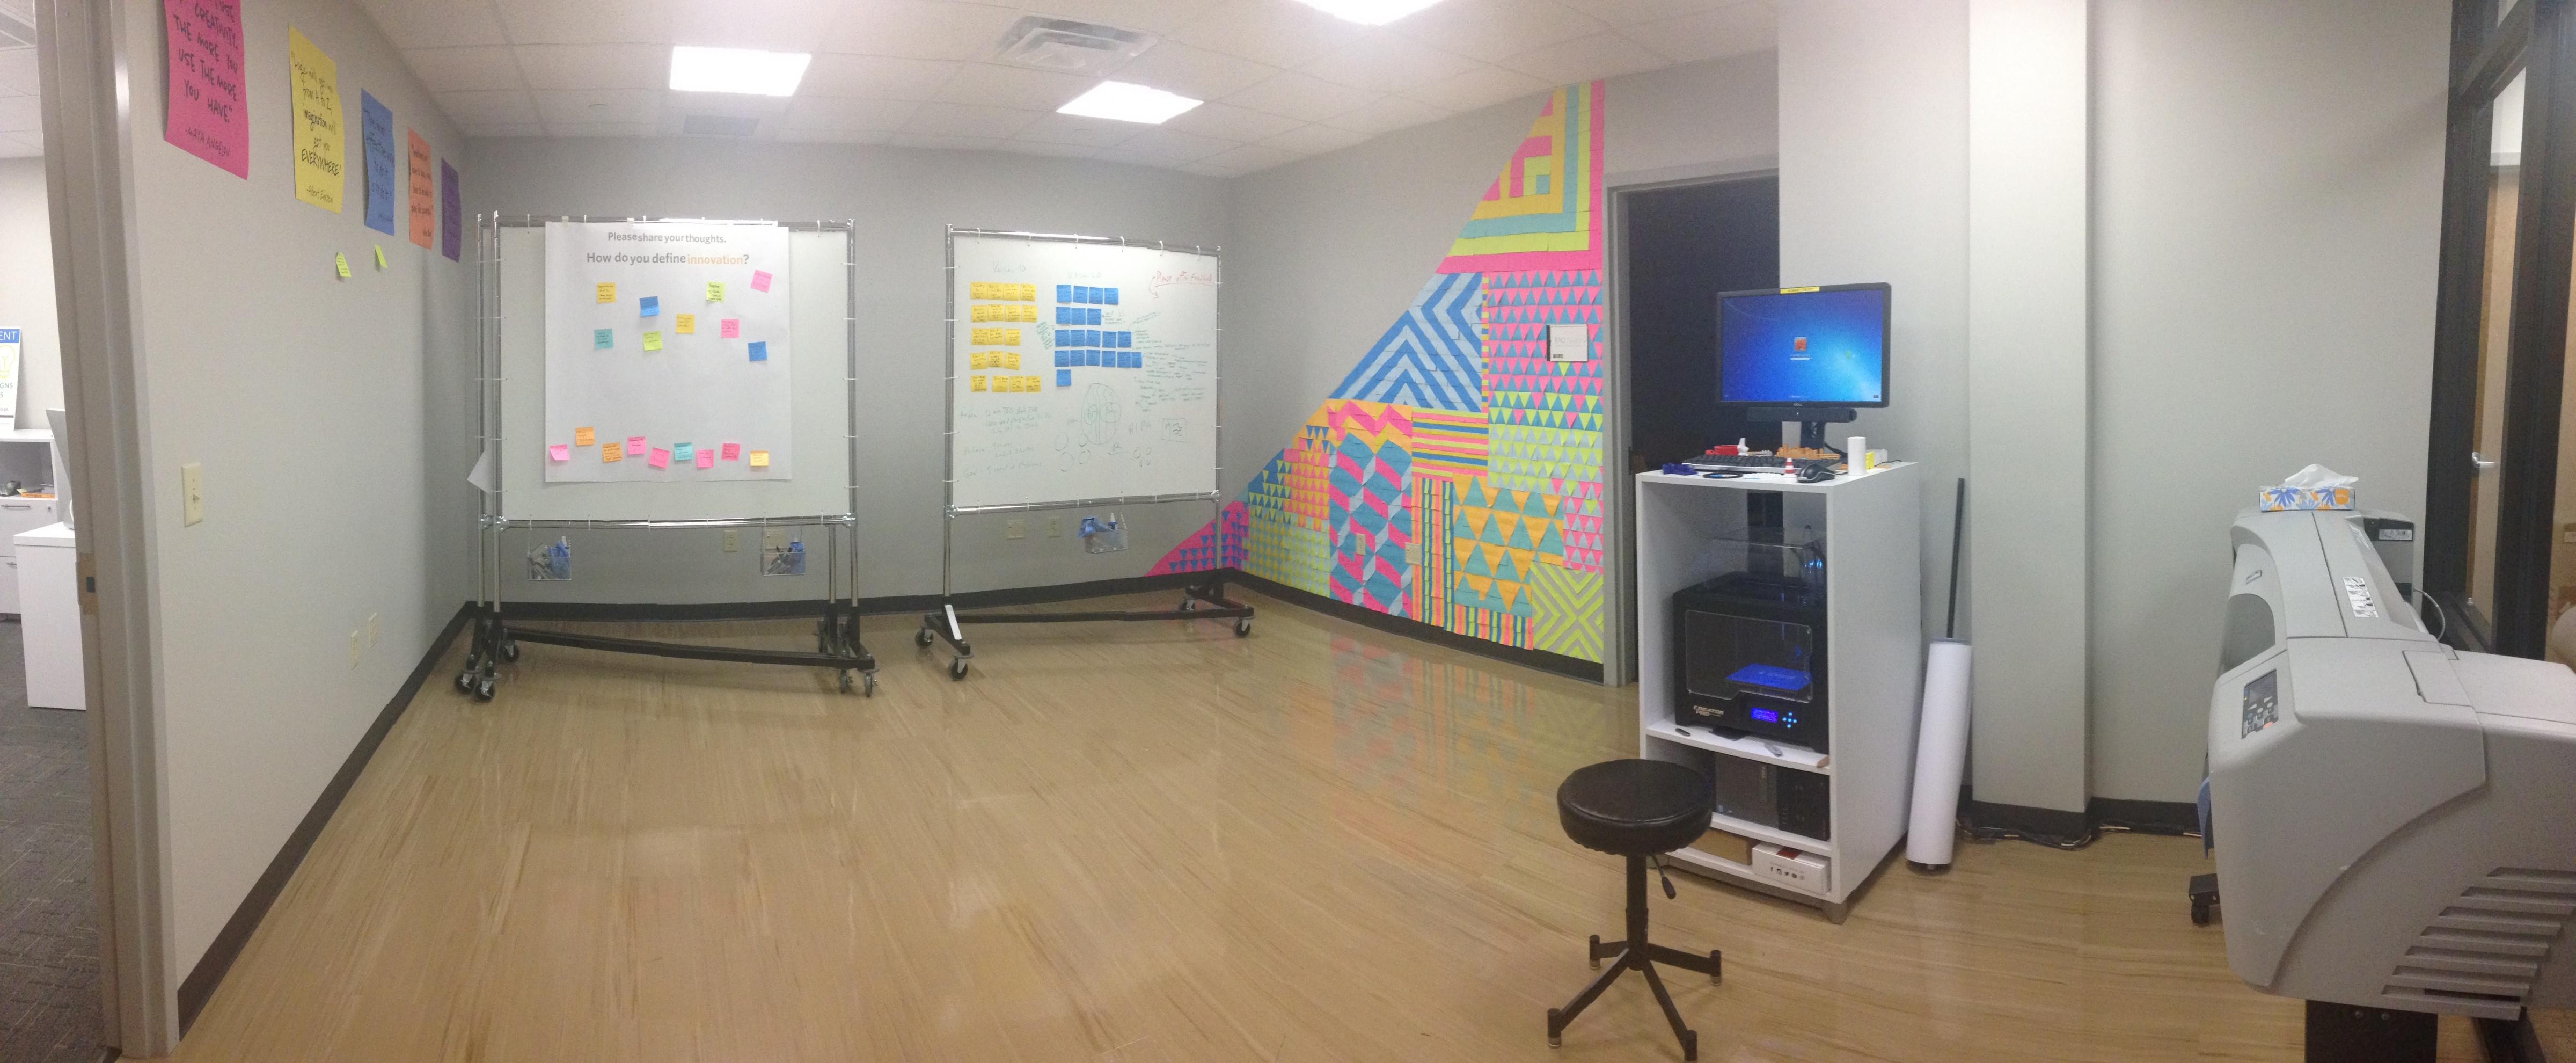 RAD Studio Makerspace and Design Thinking